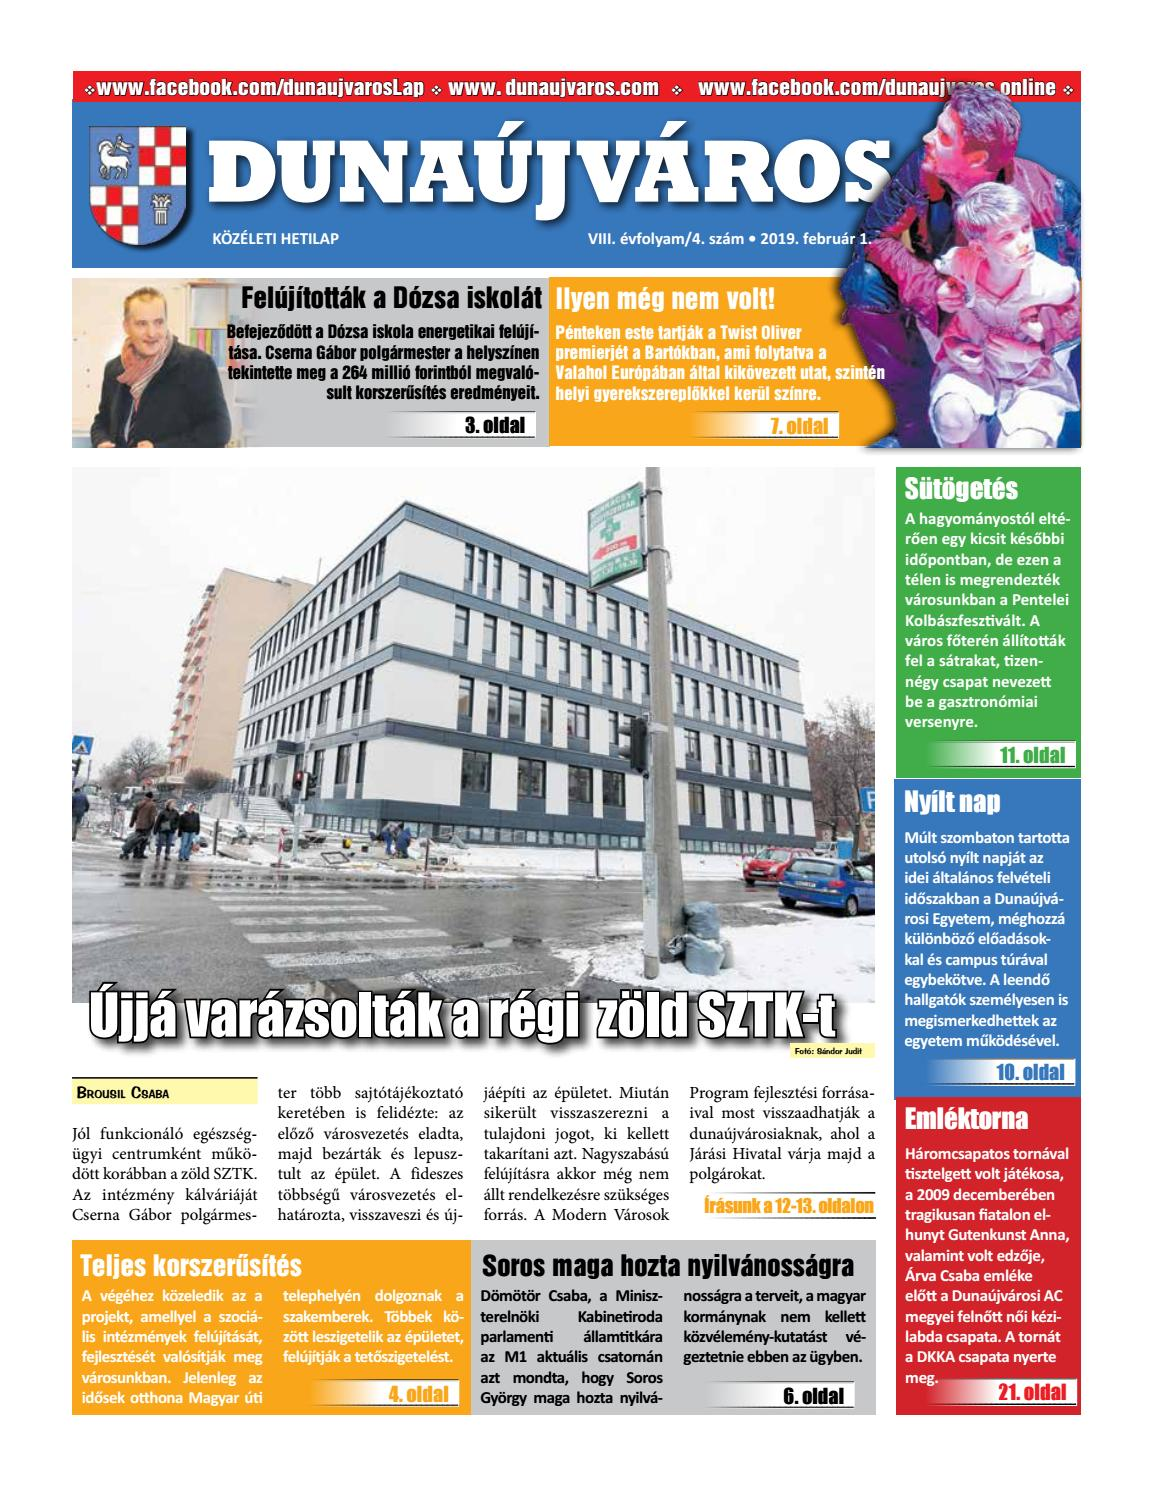 DKH 2019-02-01 by Dunaújváros Közéleti Hetilapja - issuu 442c4589f7